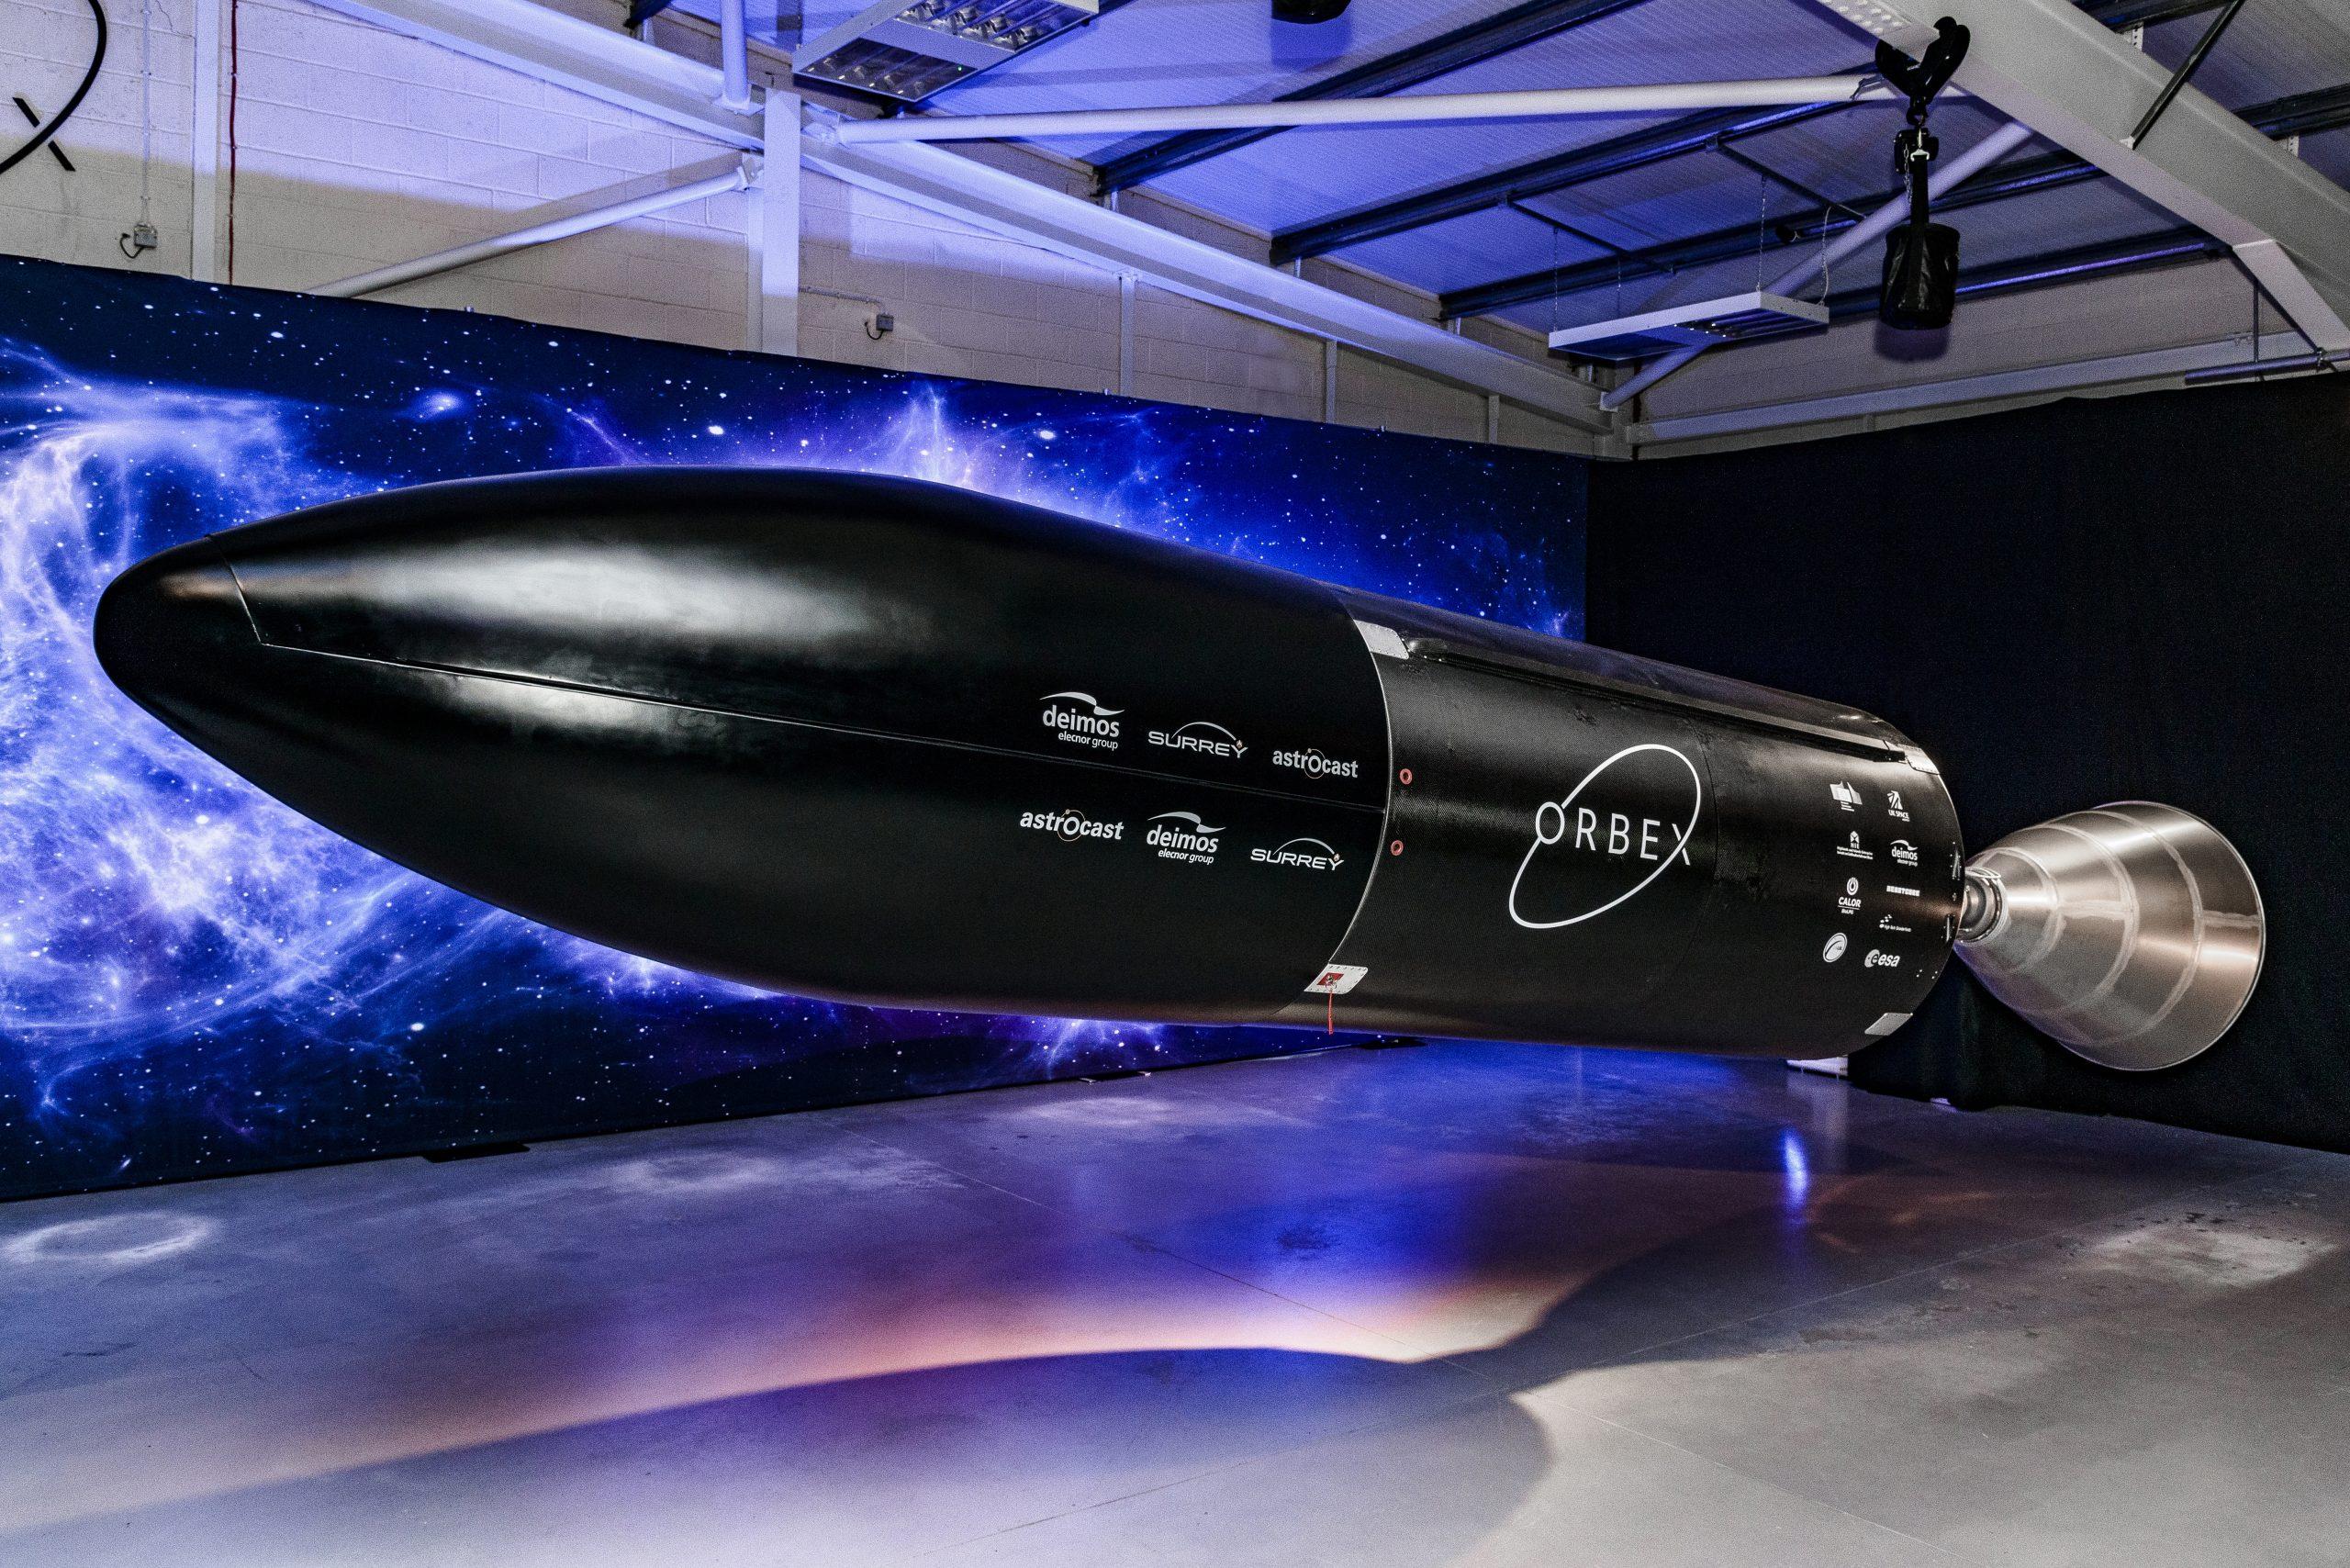 Orbex's Stage 2 Prime rocket. Image via Orbex.